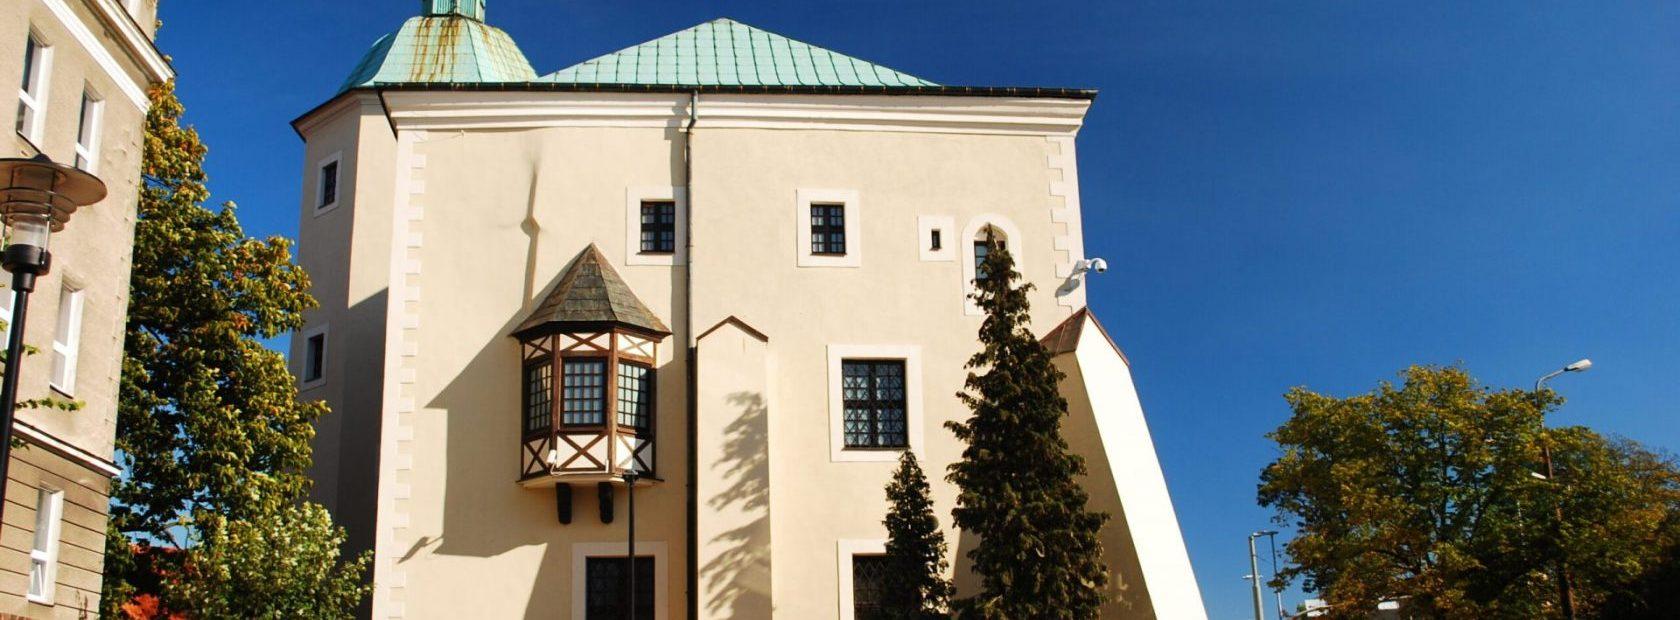 The Castle of the Pomeranian Dukes